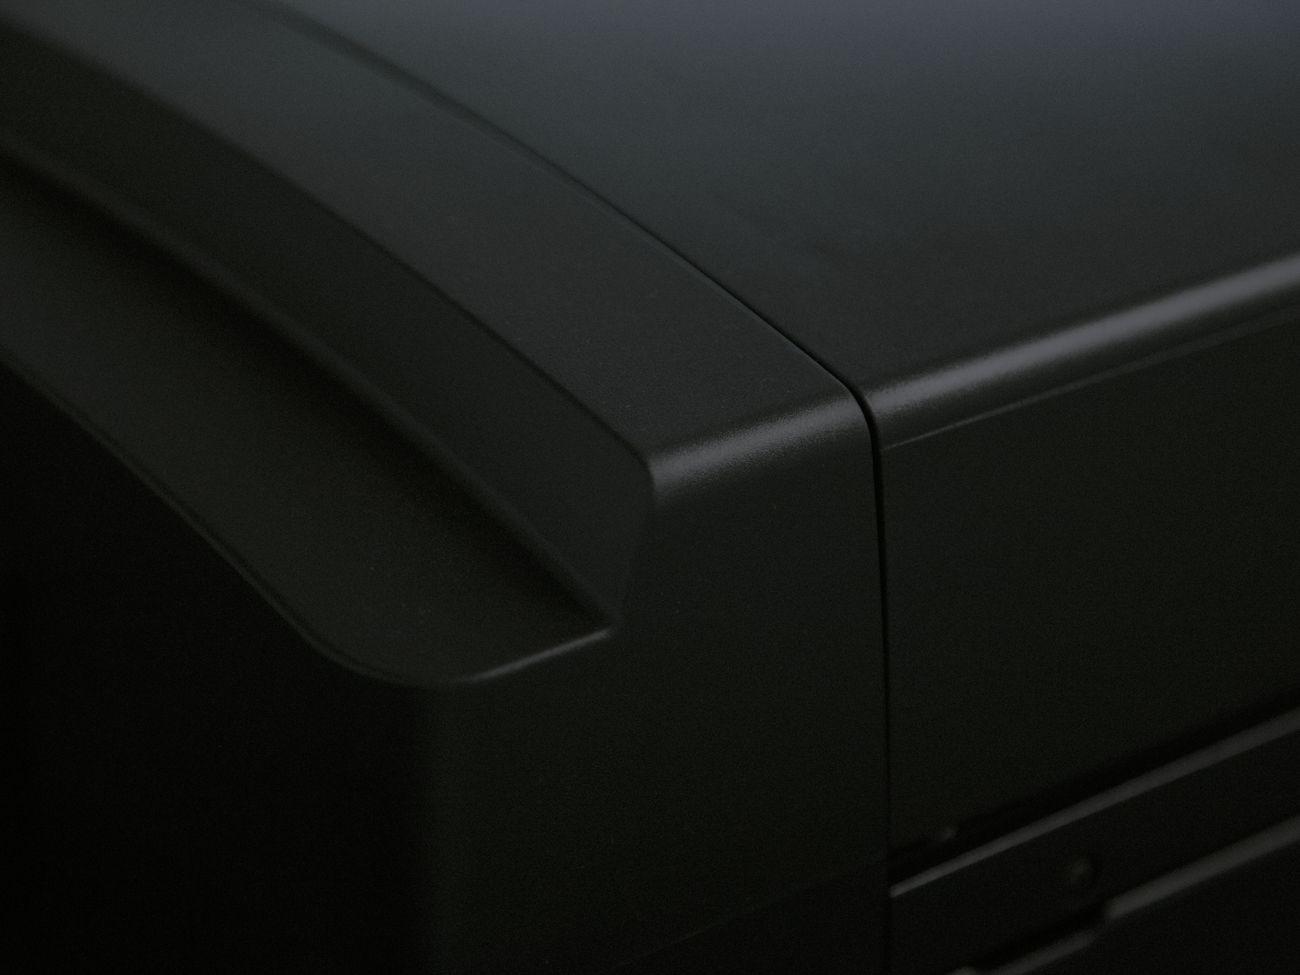 Matteo Cremonesi, Sculpture Dark Printer Office, 2019, stampa su carta fotografica, dimensioni variabili